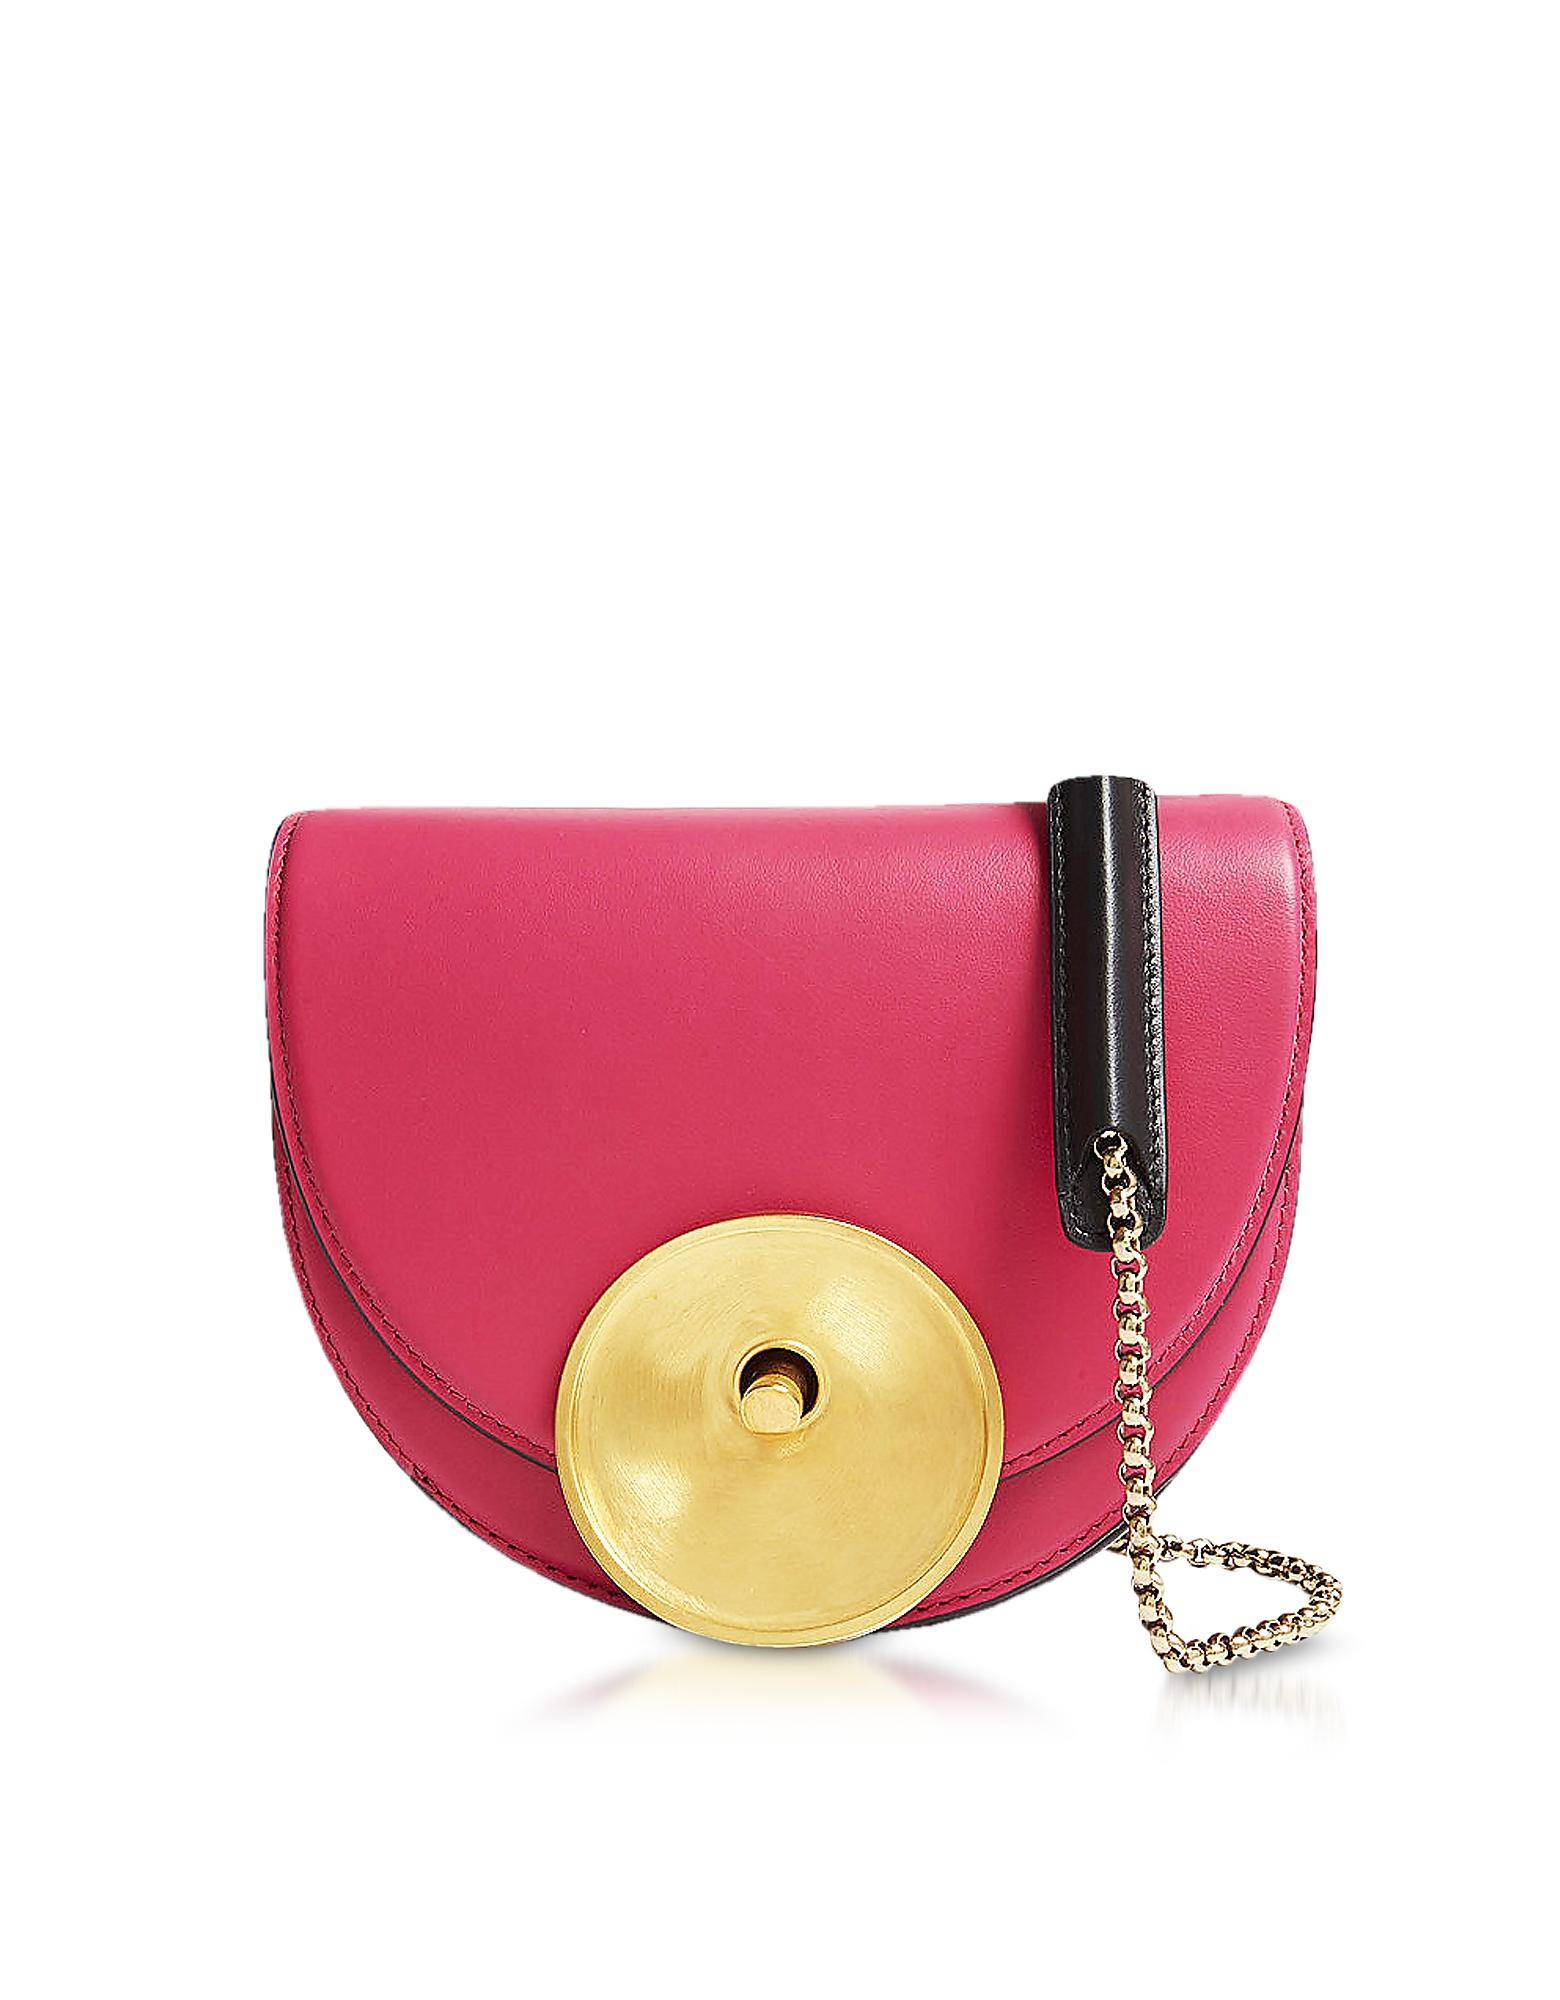 Image of Marni Designer Handbags, Misty Rose, Black and Acid Leather Monile Crossbody Bag